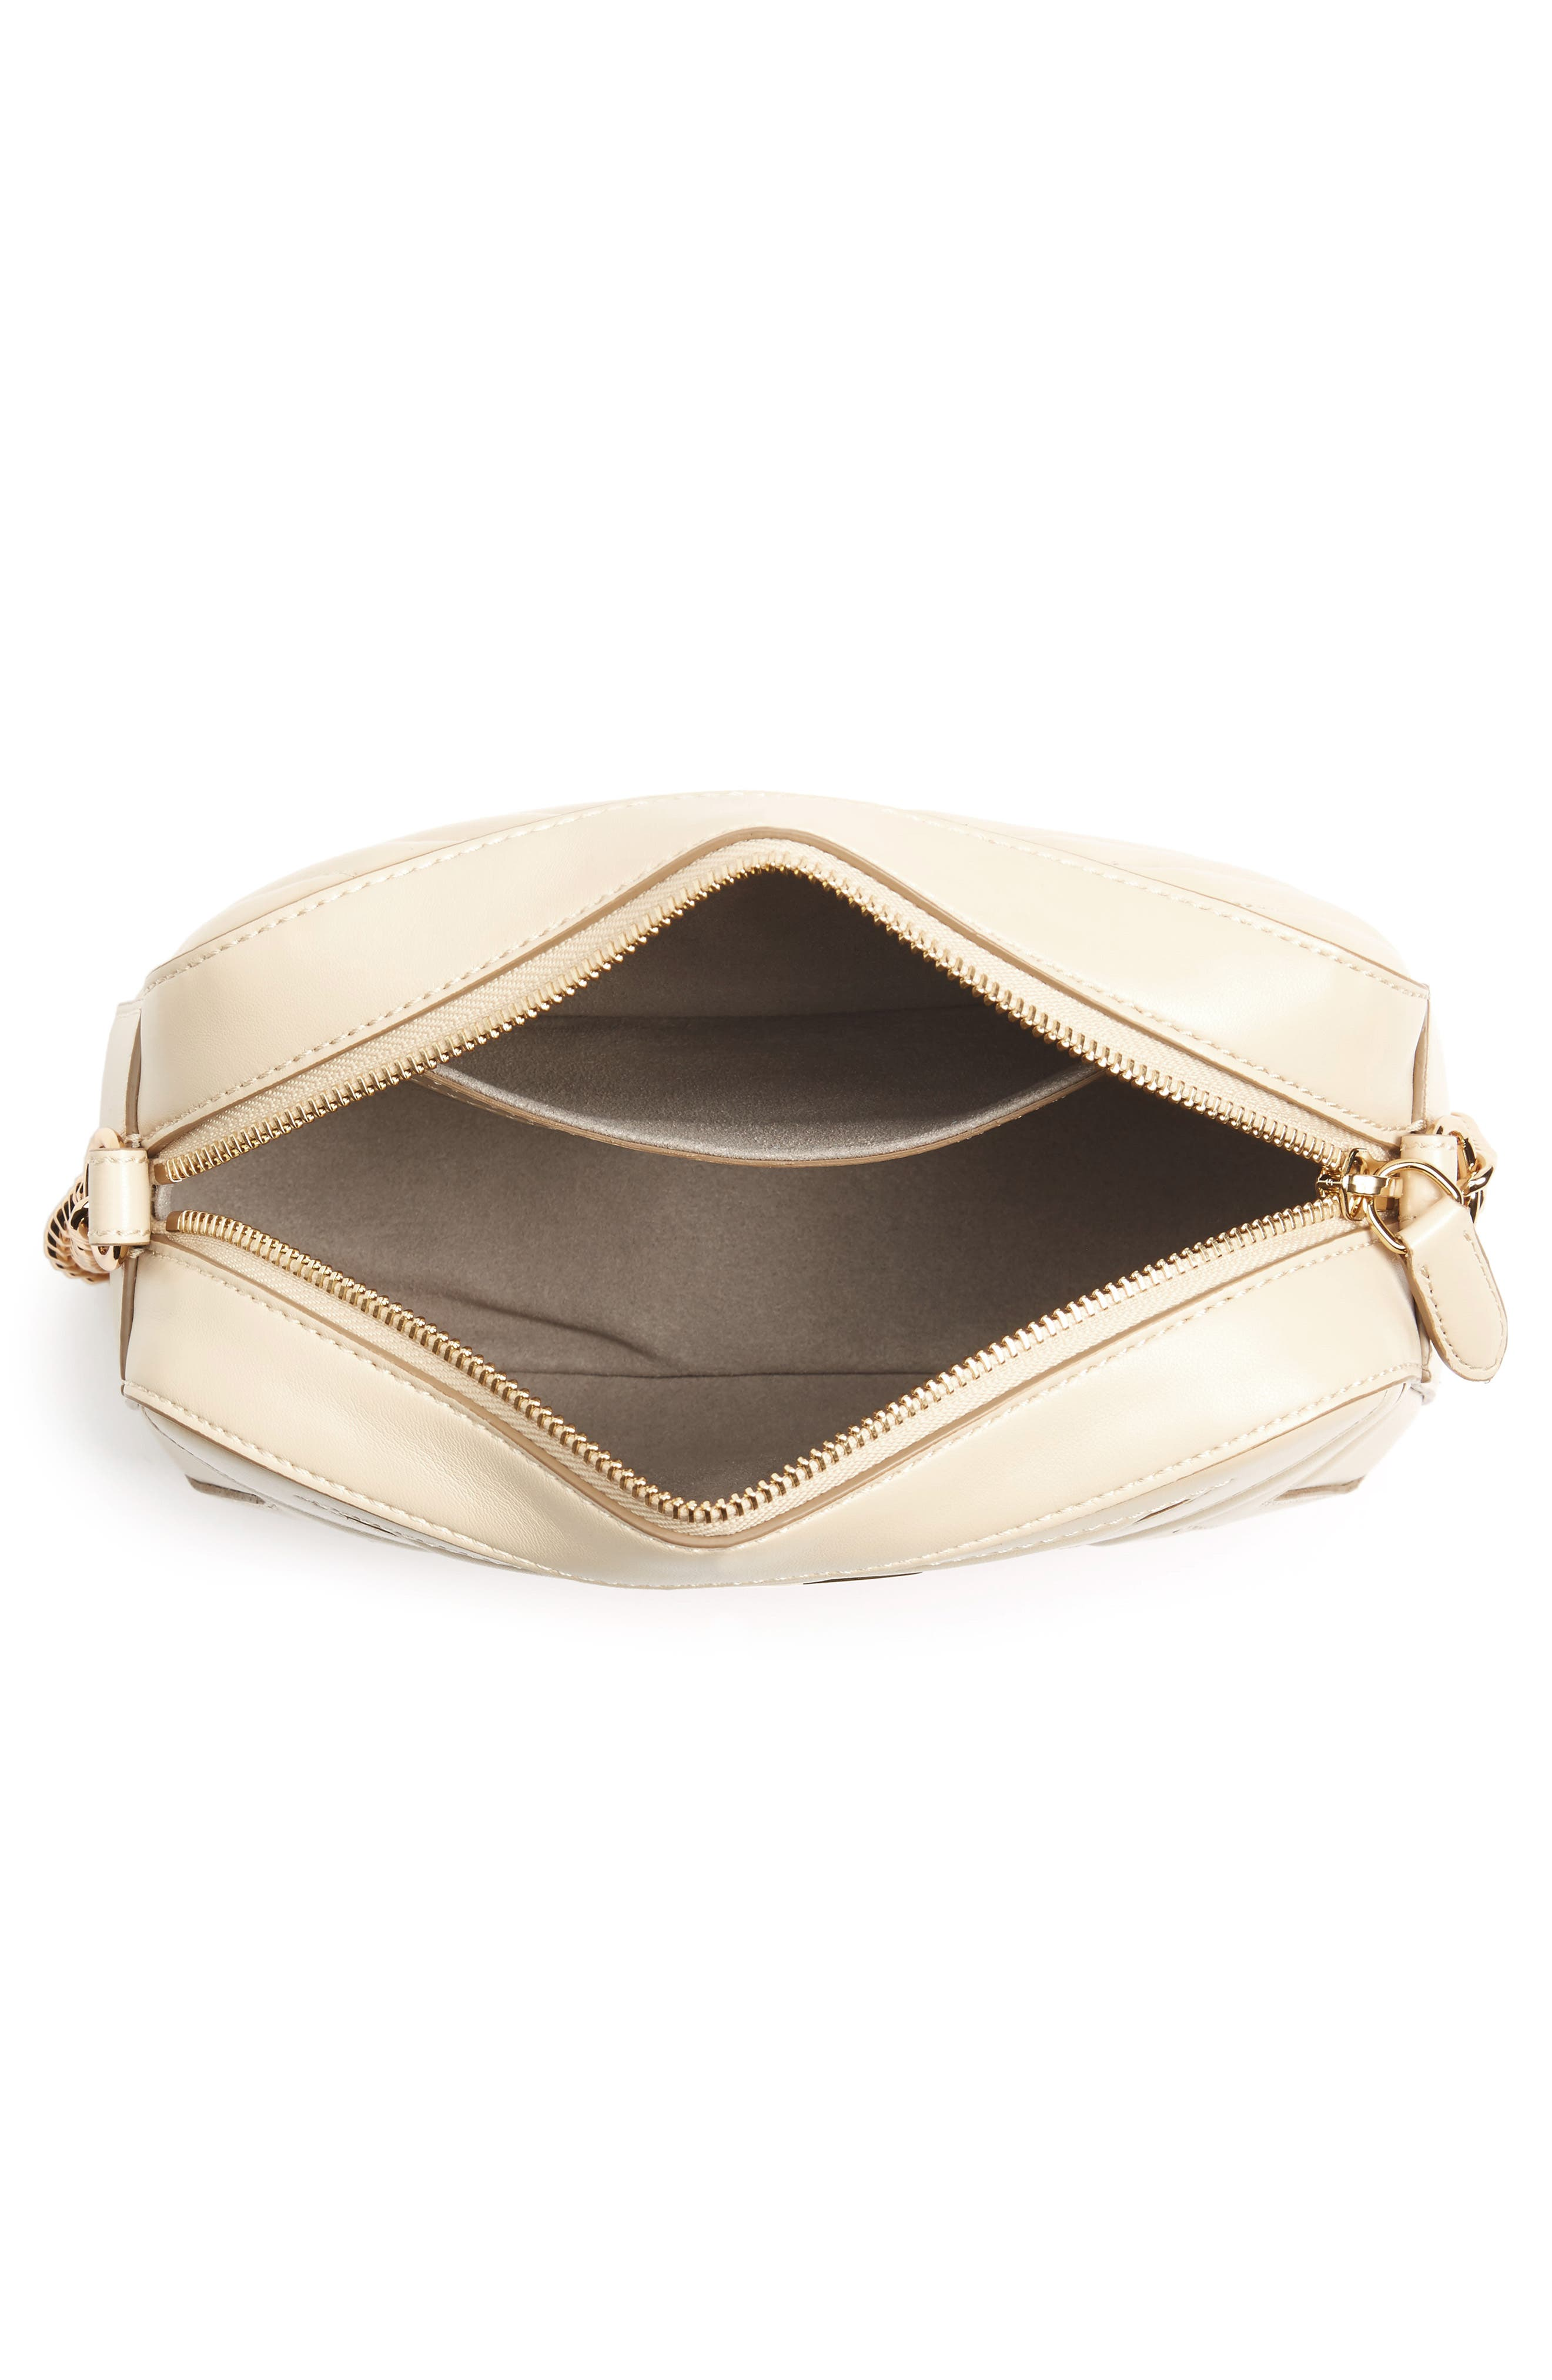 Alter Nappa Faux Leather Shoulder Bag,                             Alternate thumbnail 6, color,                             Cream